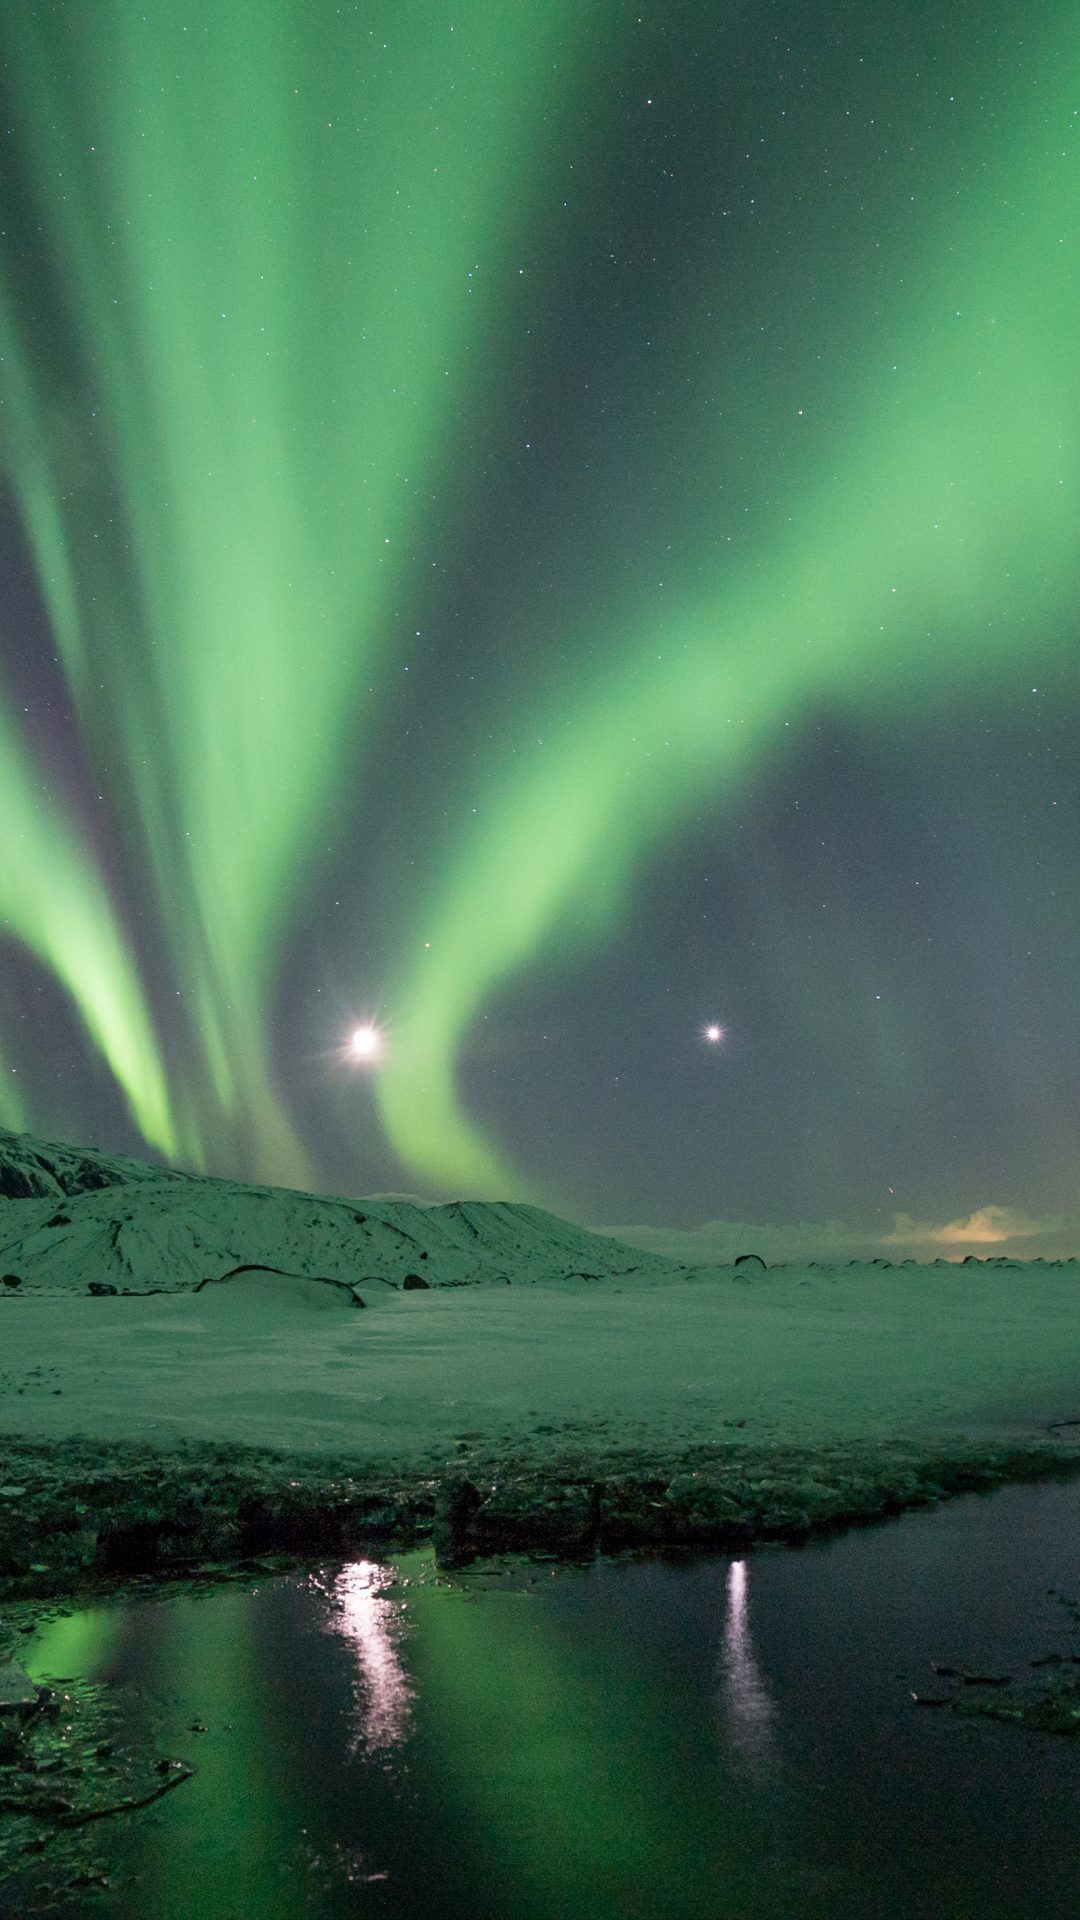 Aurora Borealis 4K UHD Wallpaper